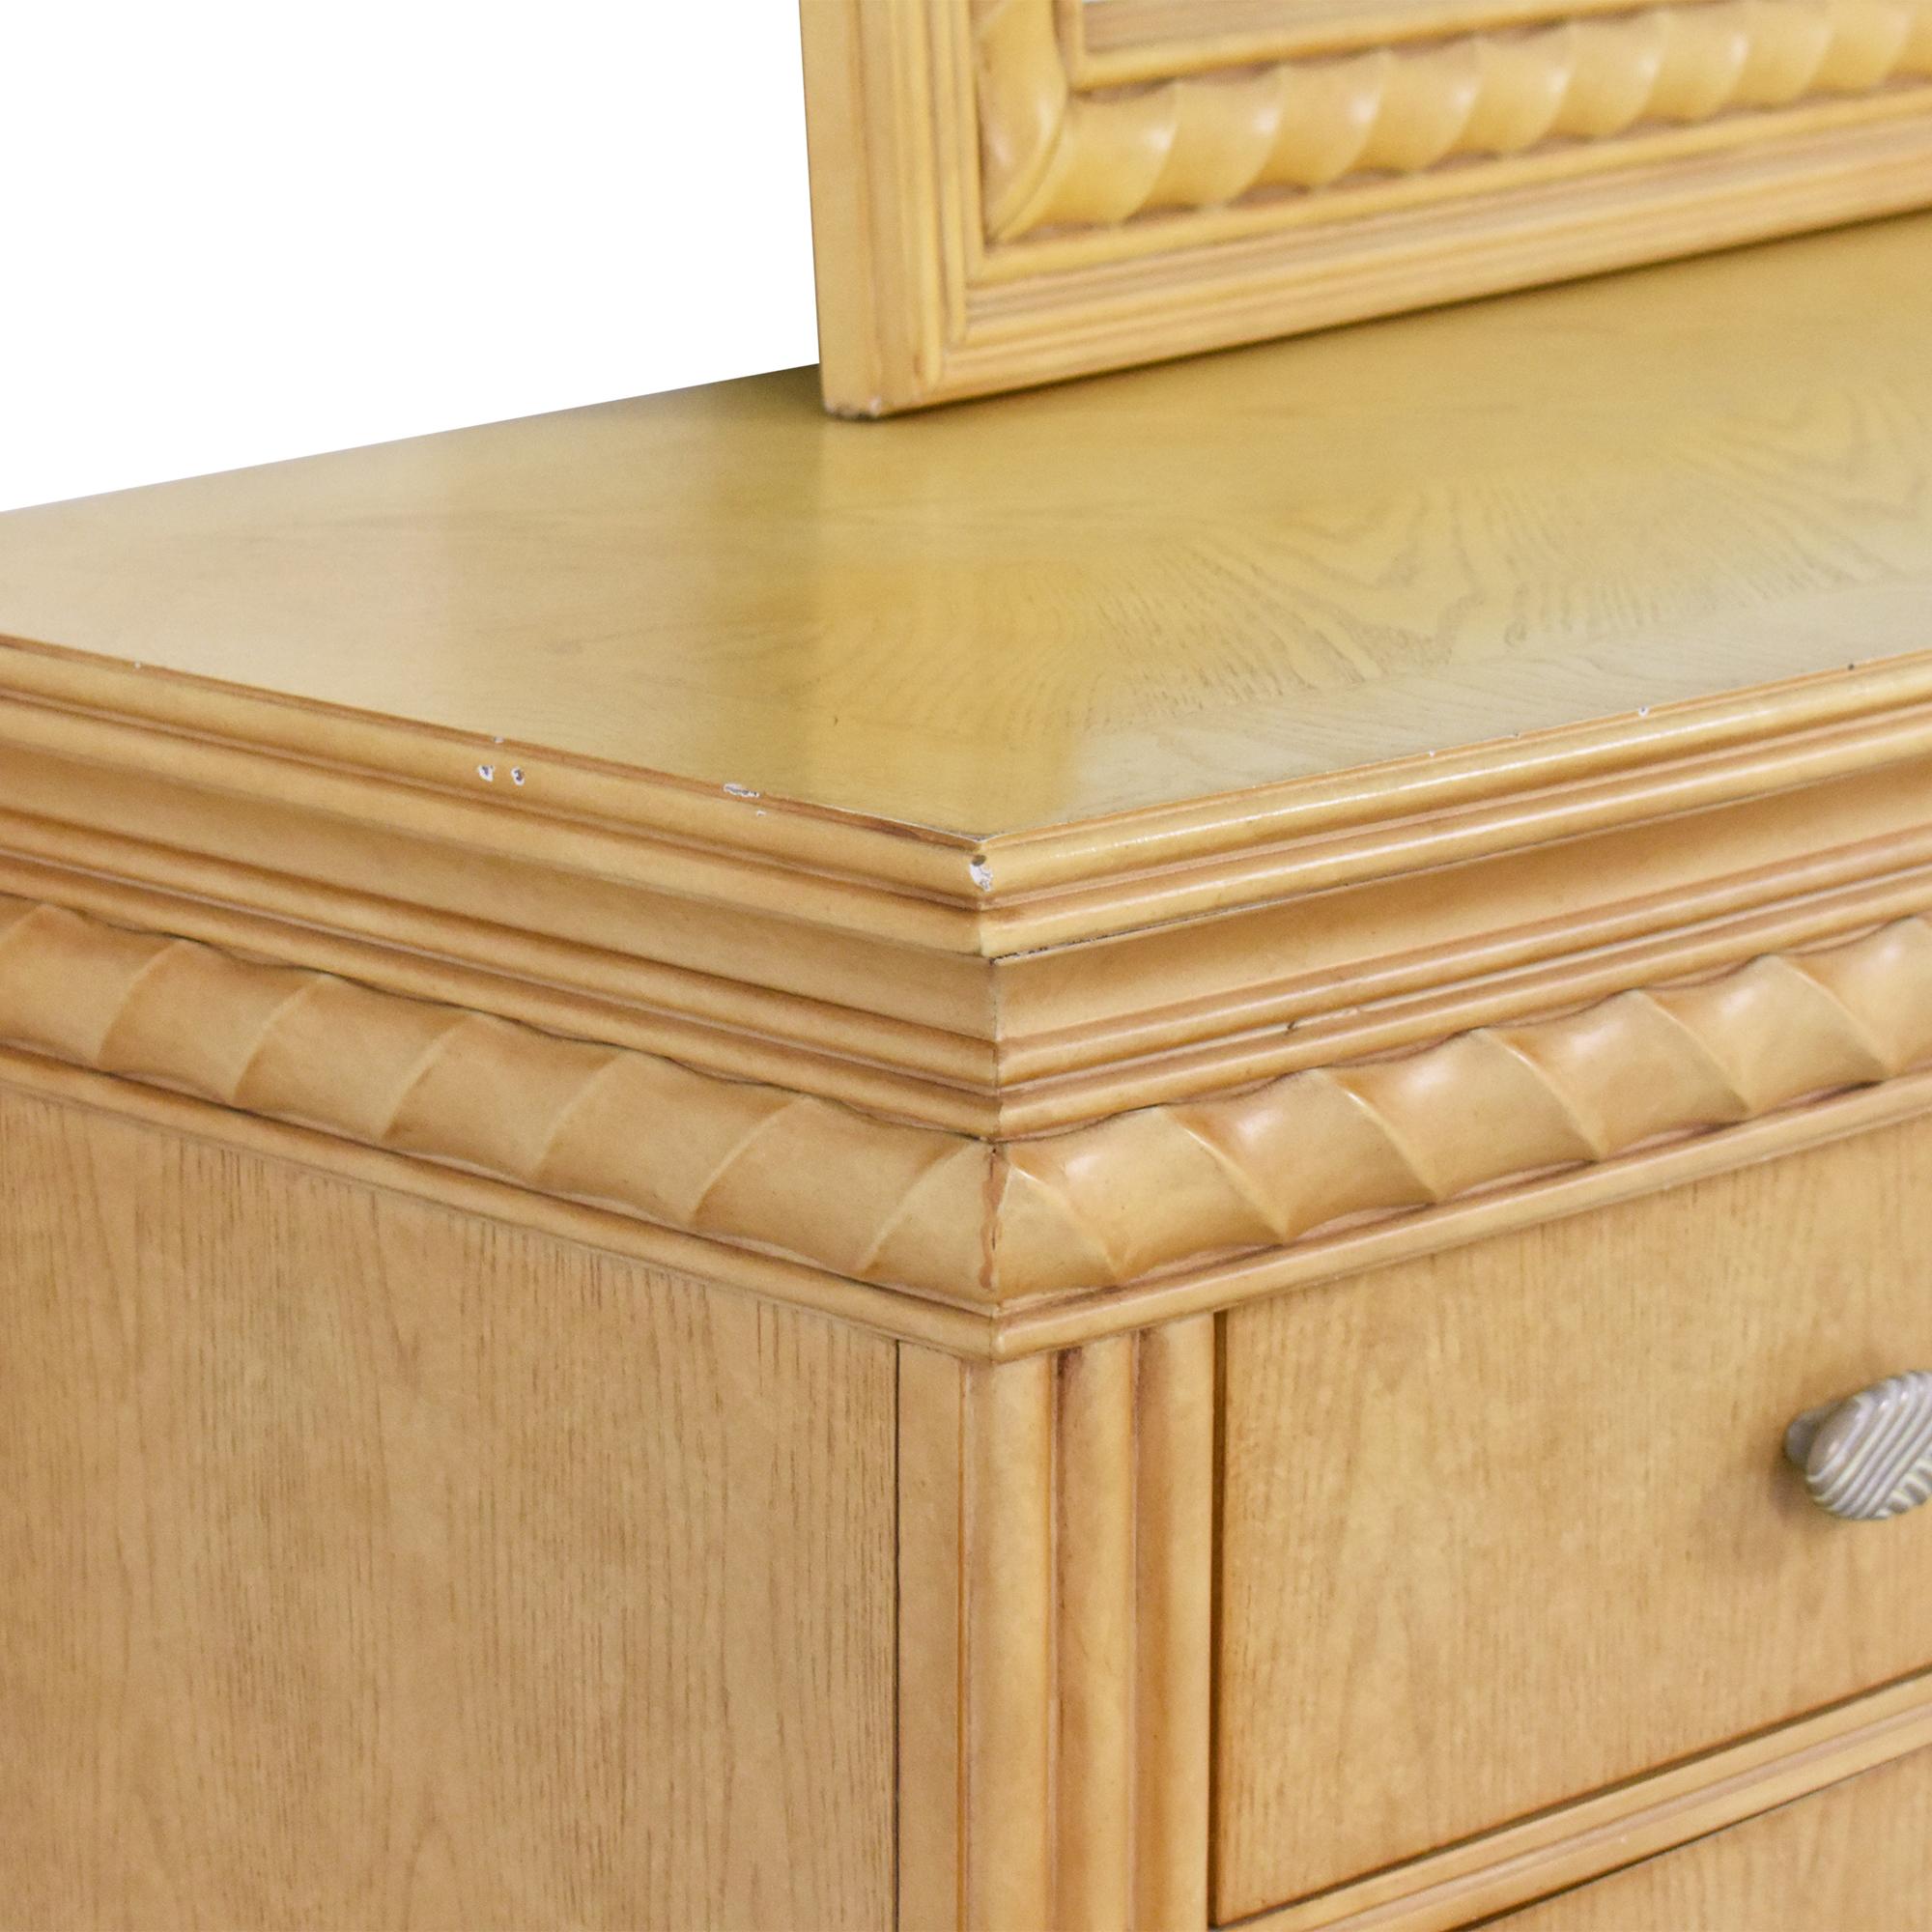 Raymour & Flanigan Triple Dresser with Mirror / Storage